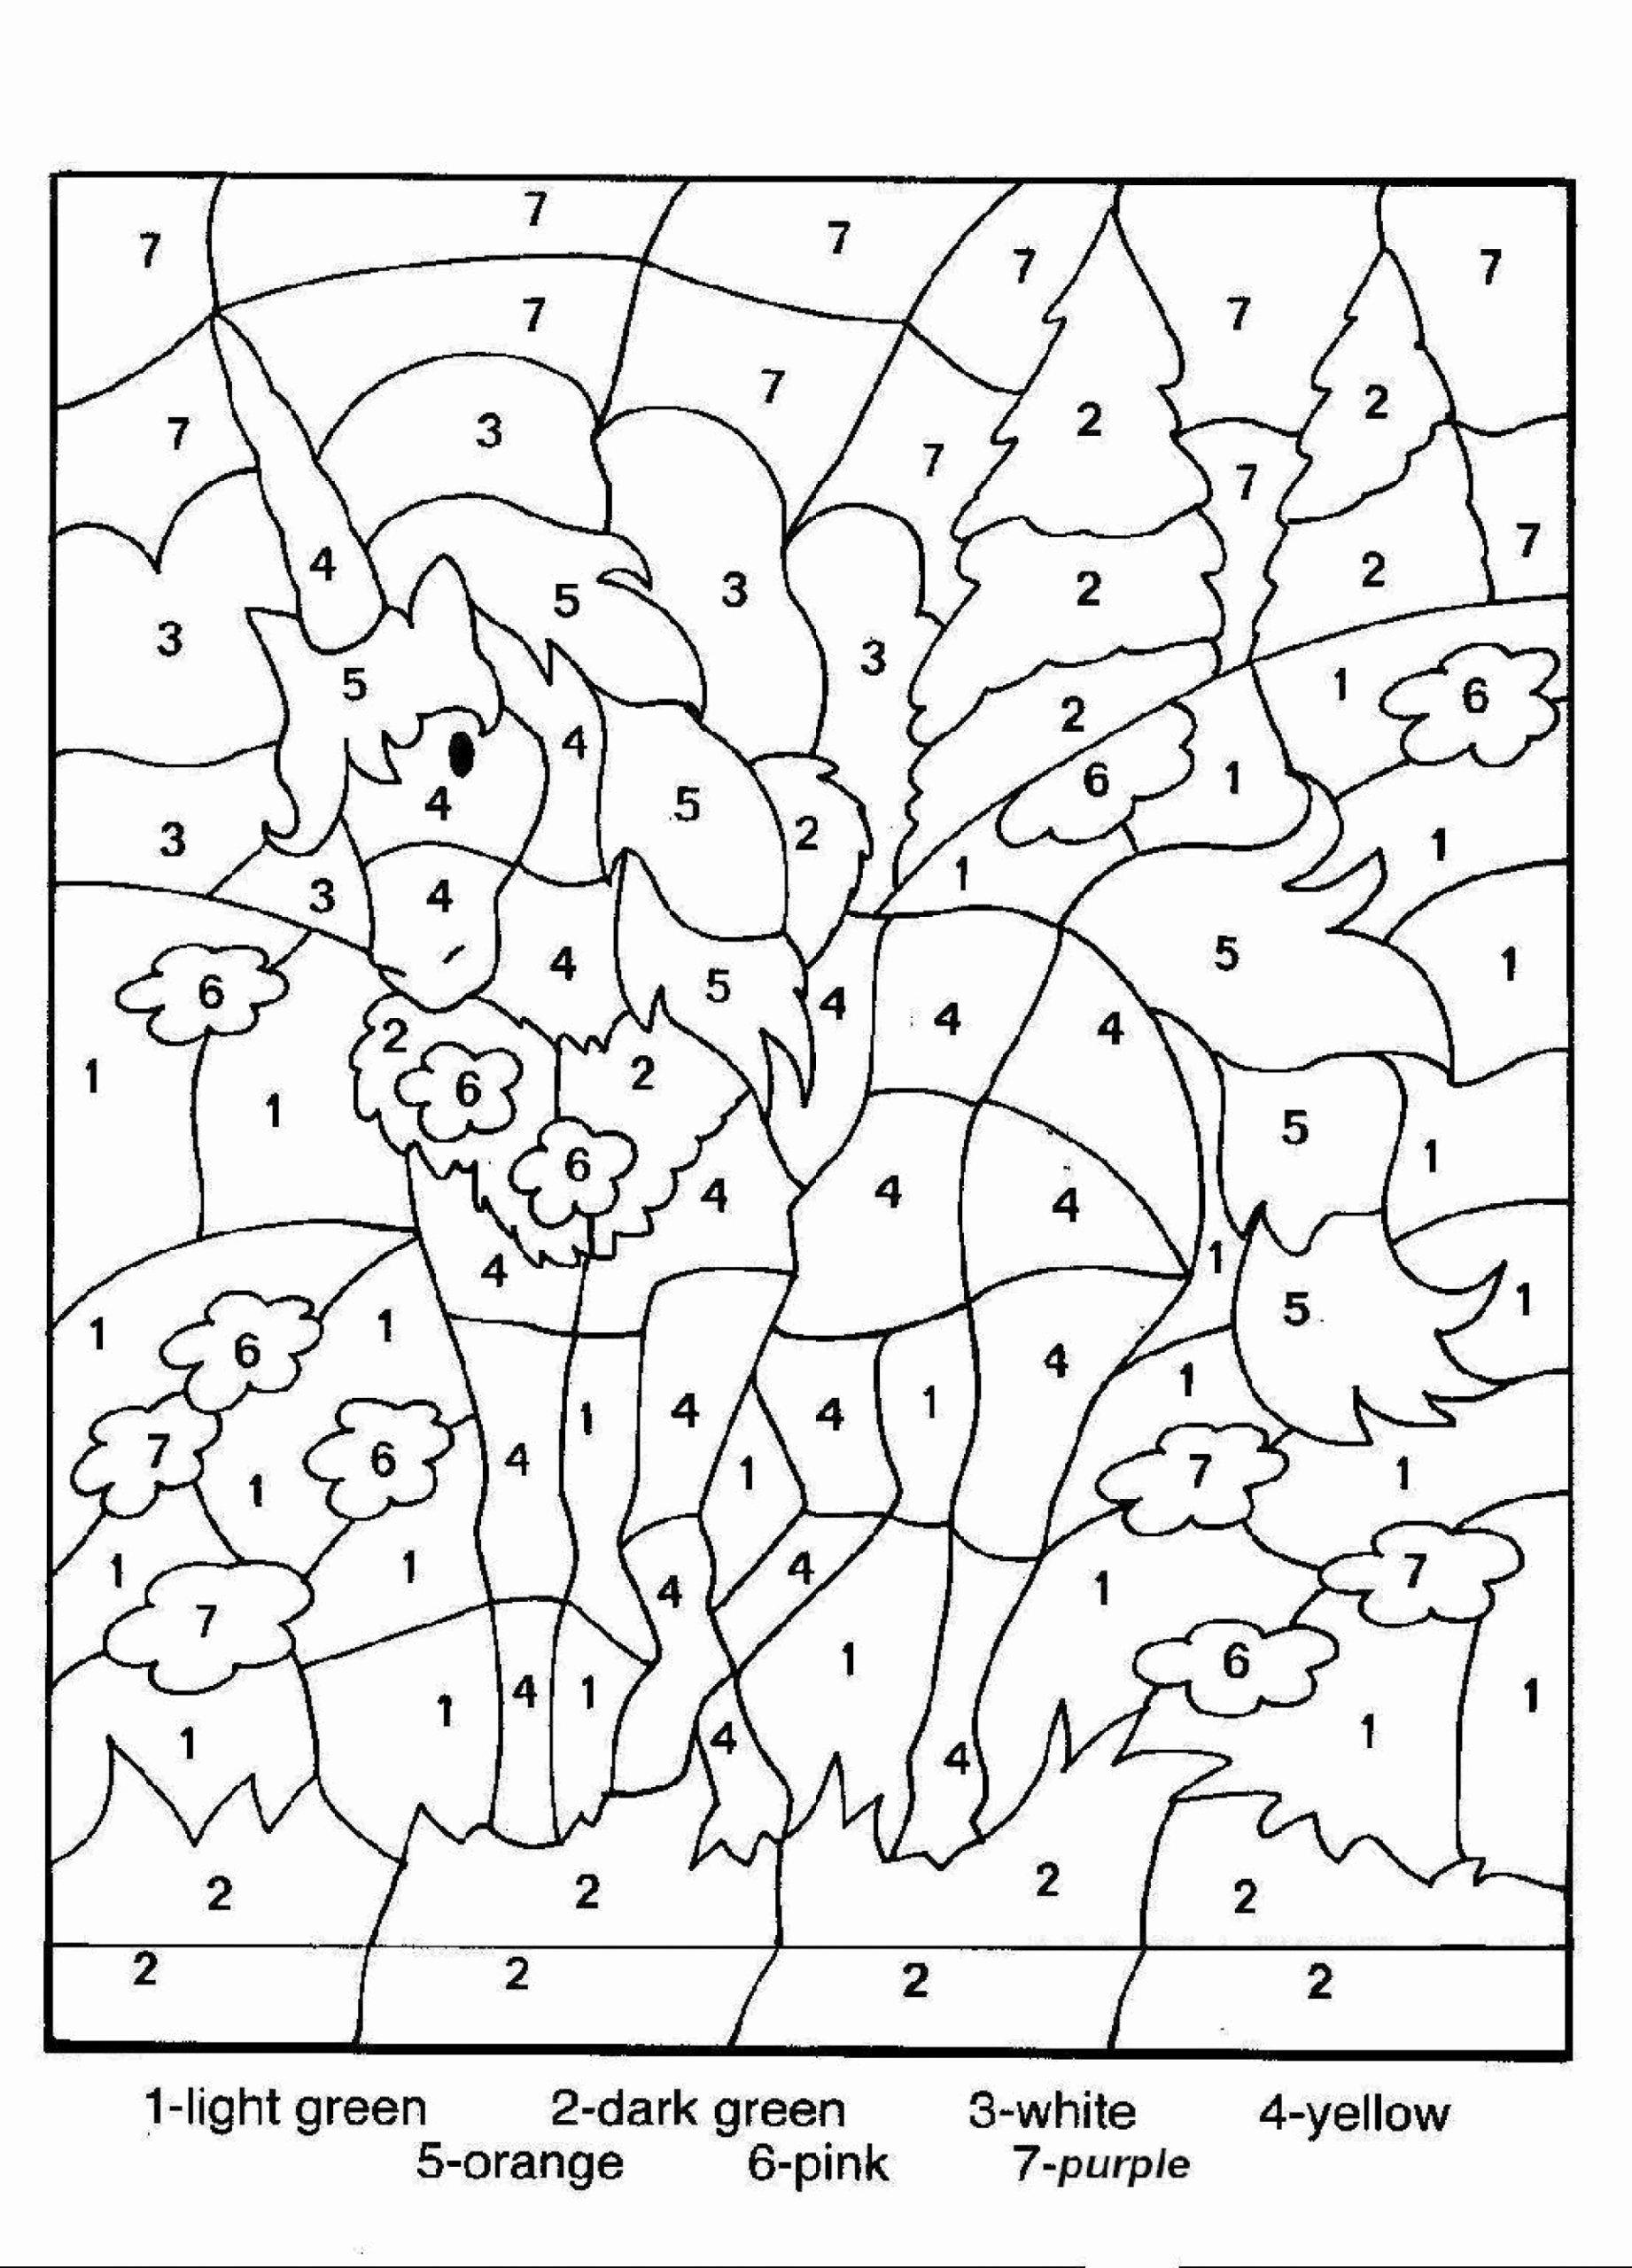 Division Coloring Worksheets 3rd Grade Printable 4th Grade Math Multiplication Coloringheets Christmas